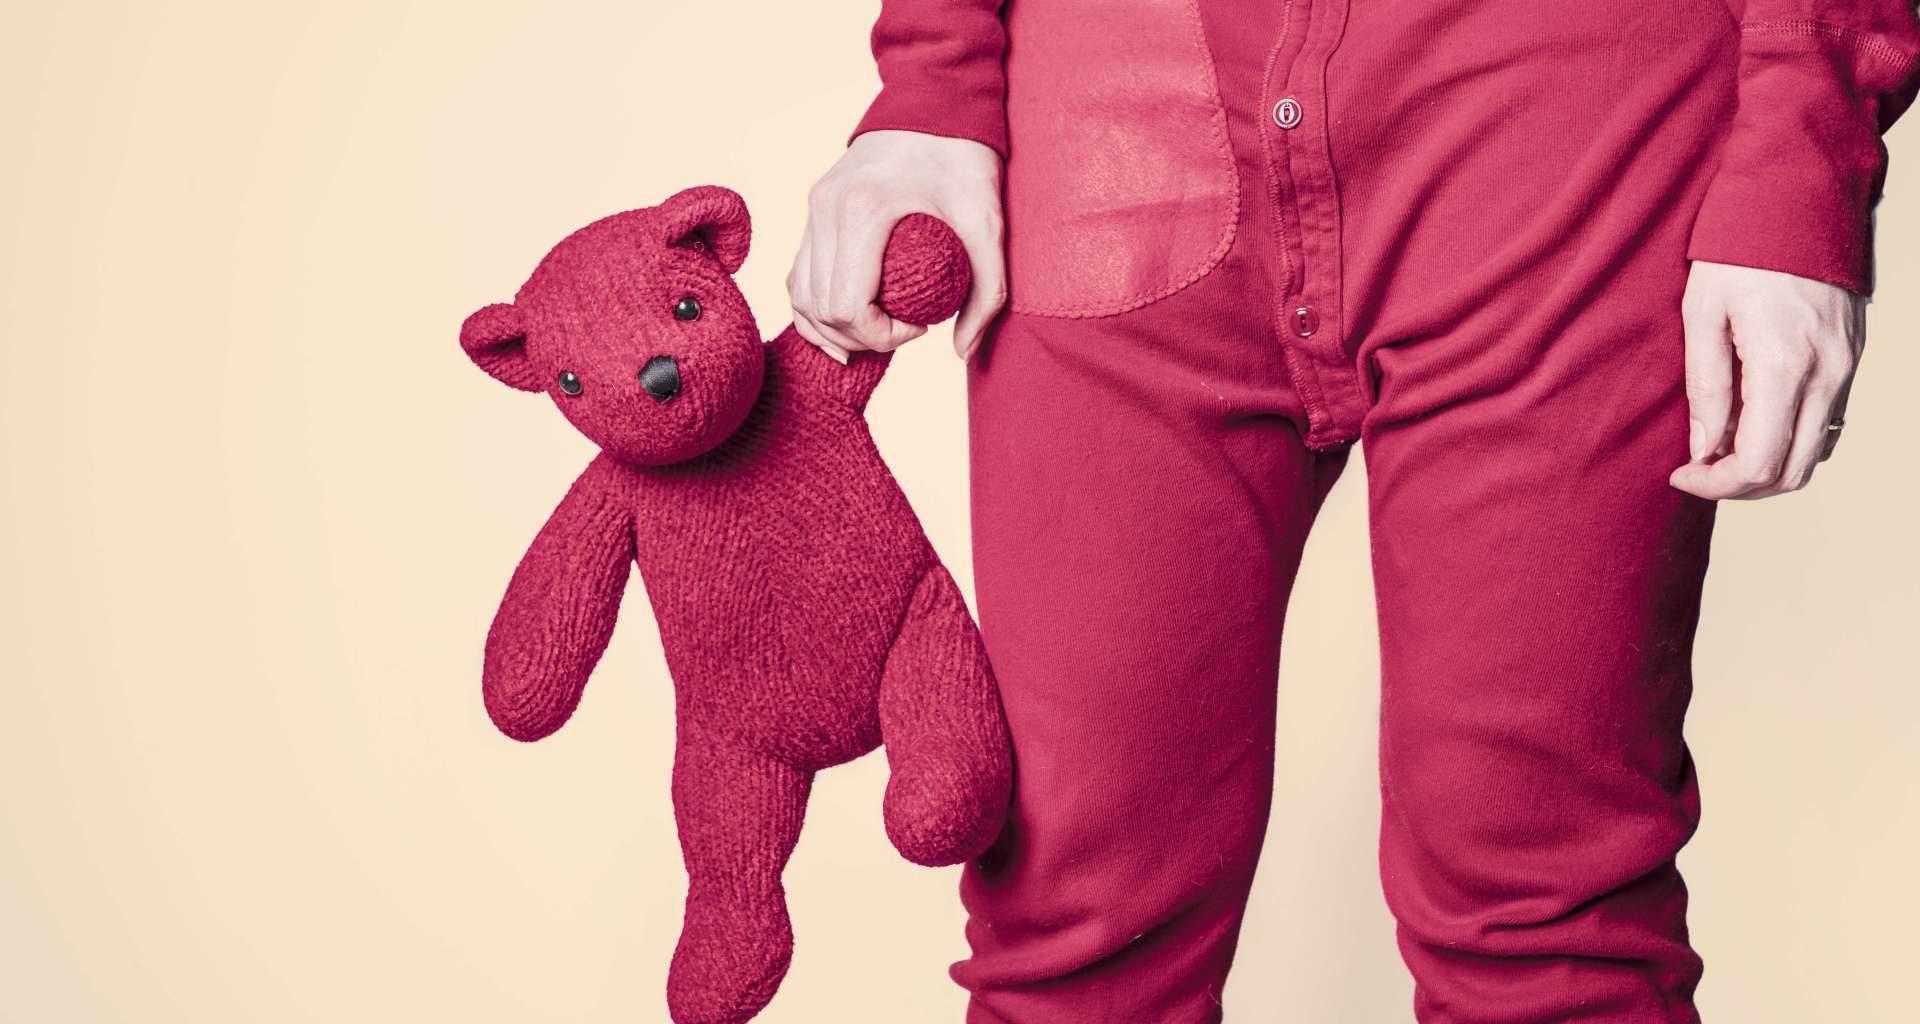 розовая игрушка и ребенок